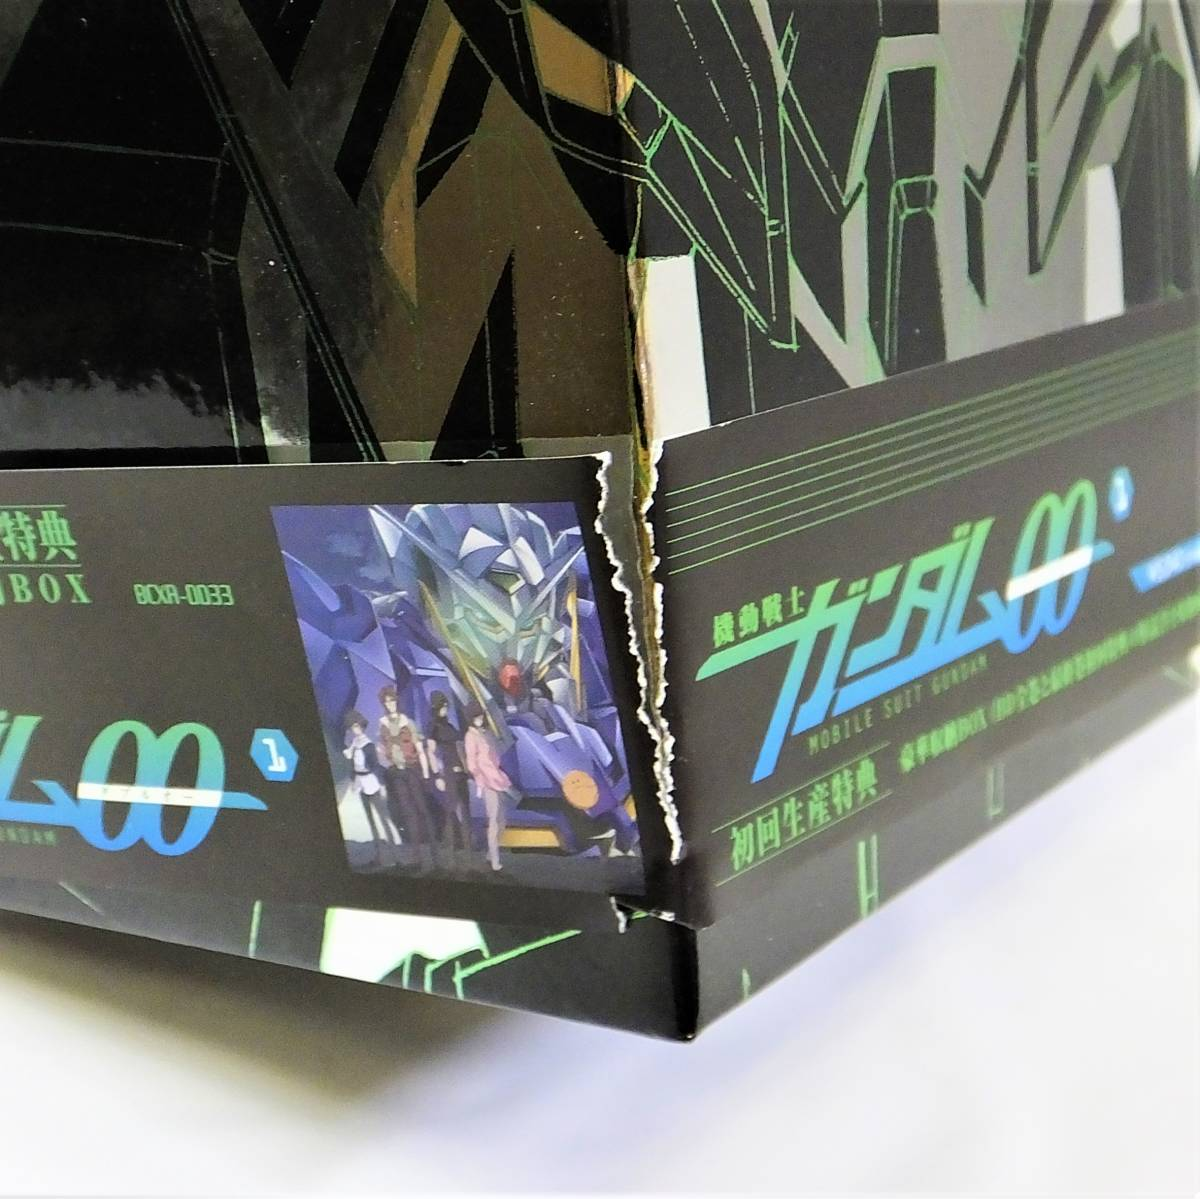 Blu-ray♪USED◎アニメ/宮野真守◆機動戦士ガンダム 00 -ダブルオー- 1[初回生産特典◆豪華収納BOX] (BCXA0033)◆定形外郵便◎管理D1075_帯に破れ箇所あります。